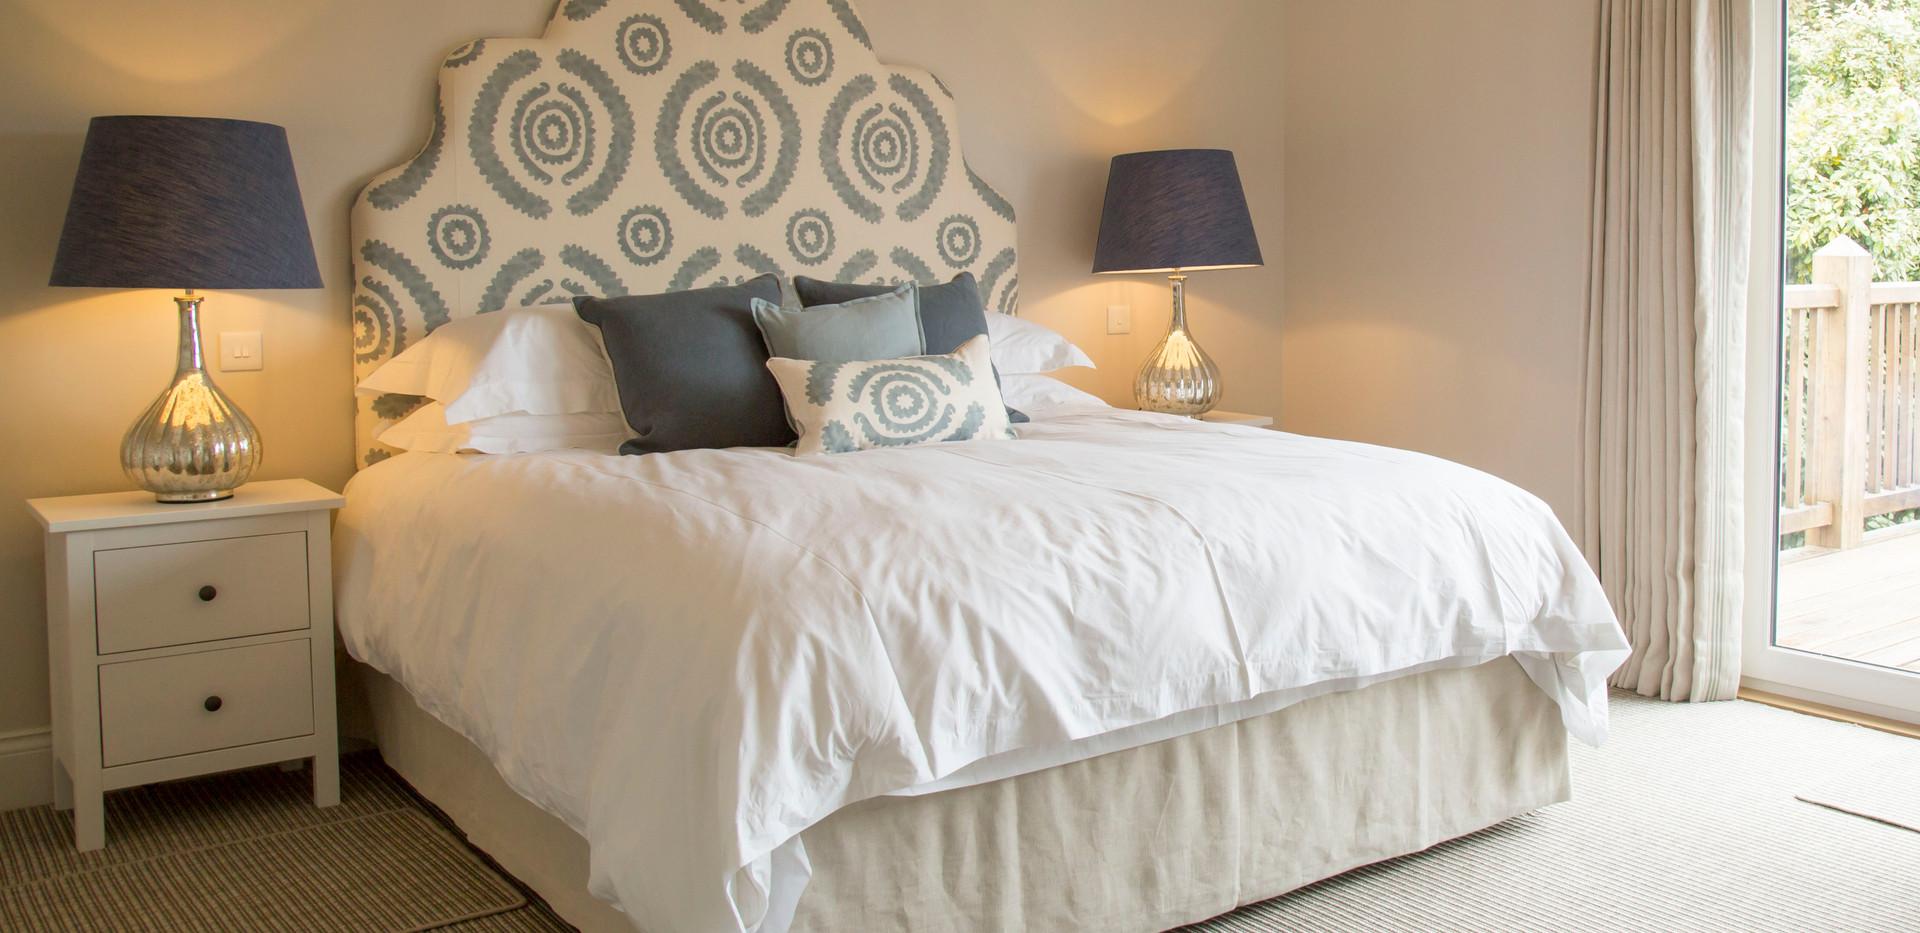 La Grange - Bedroom